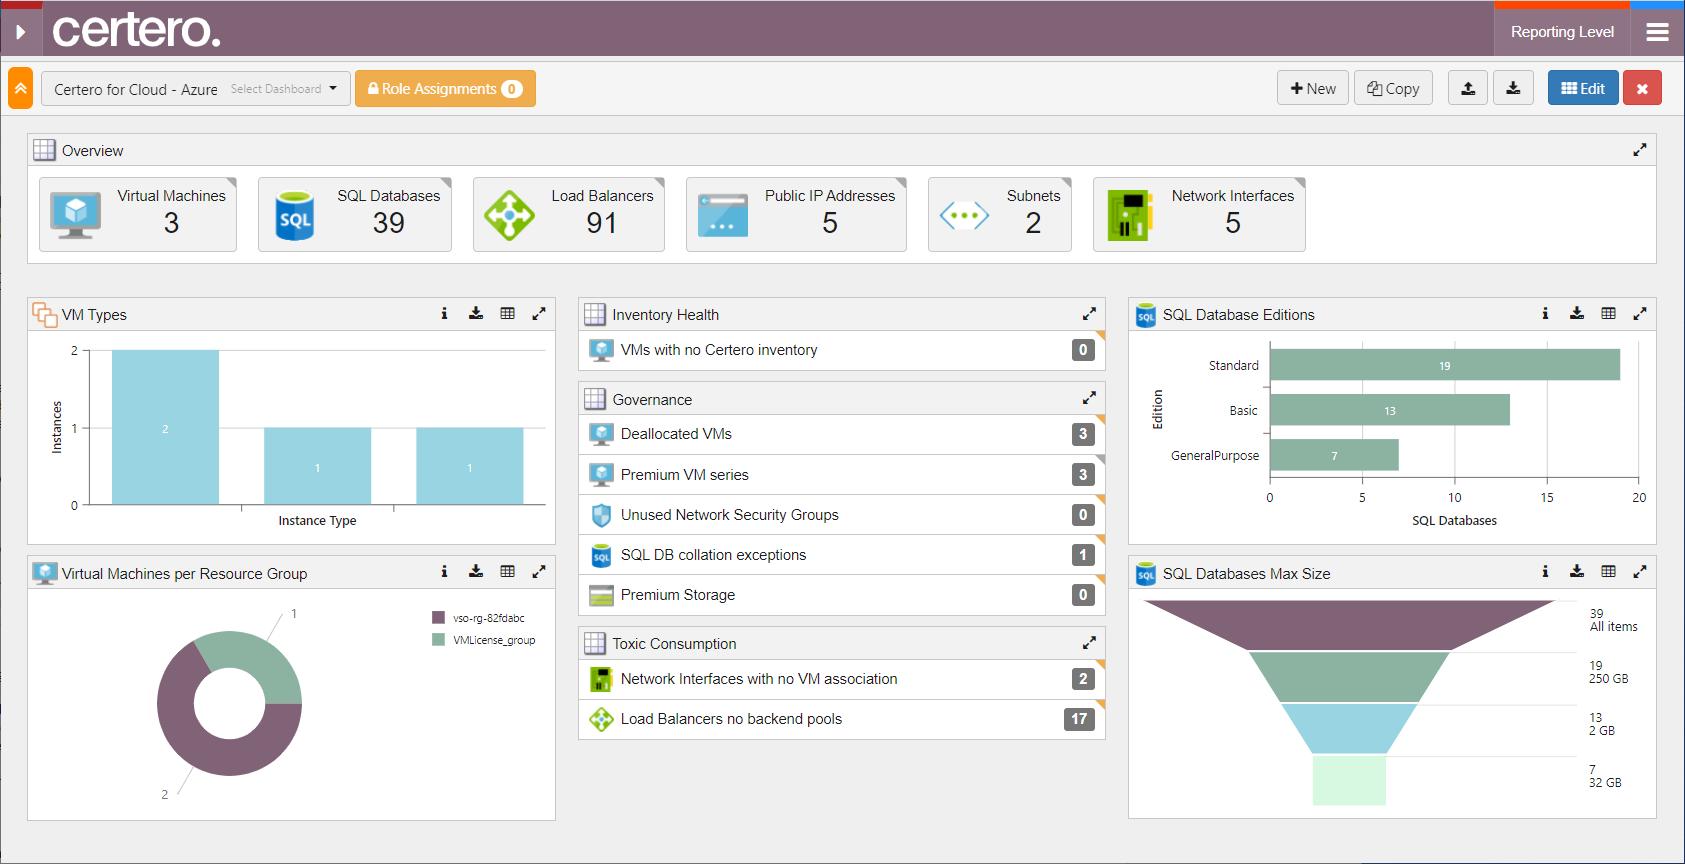 Certero for Cloud Software - 1